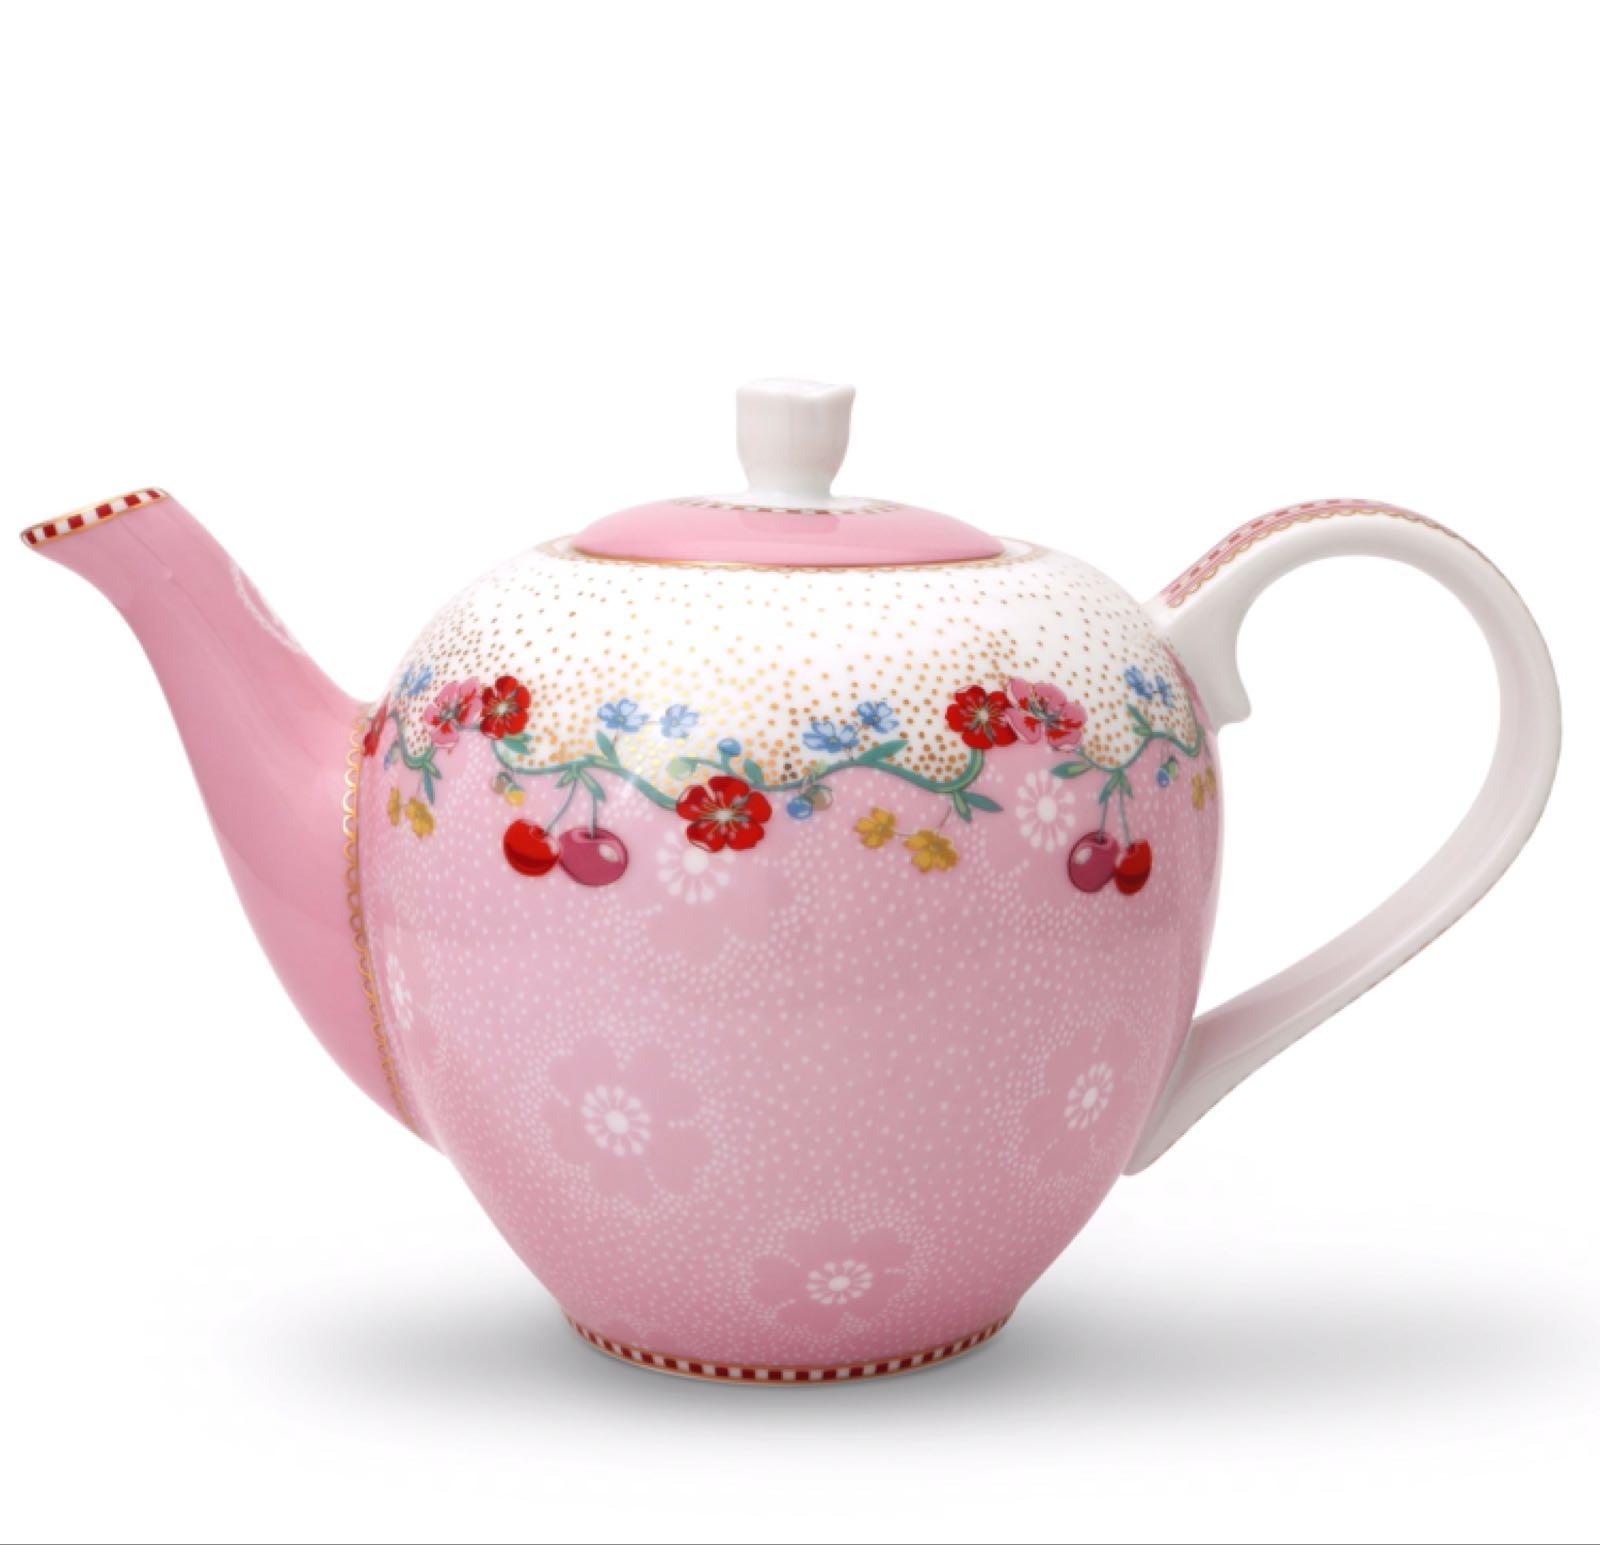 Pip studio small cherry pink teapot 750